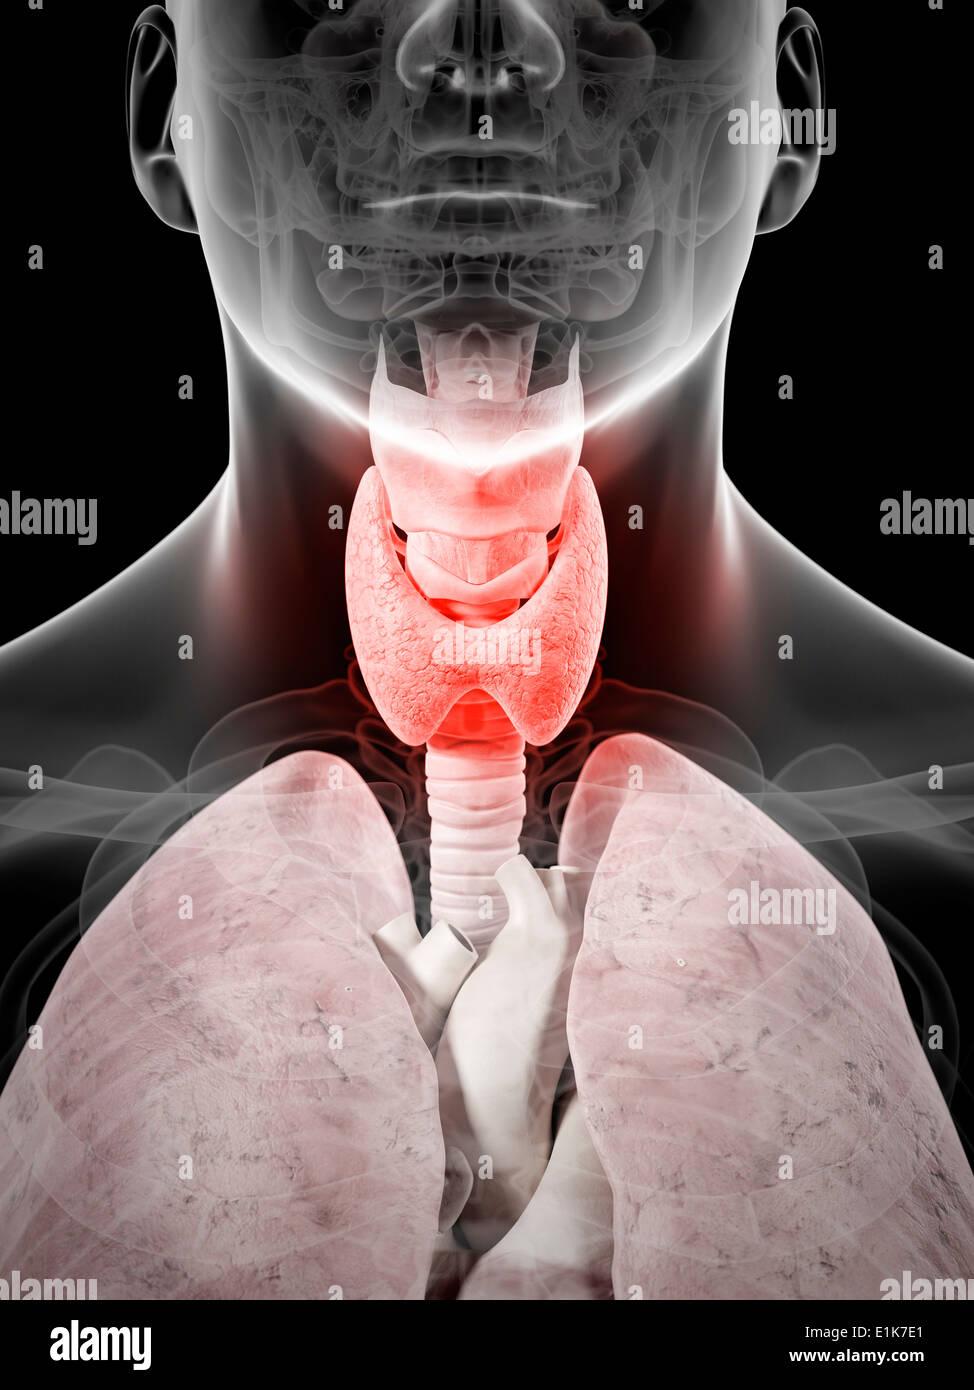 Equipo De Tiroides Inflamada Ilustraciones Foto Imagen De Stock